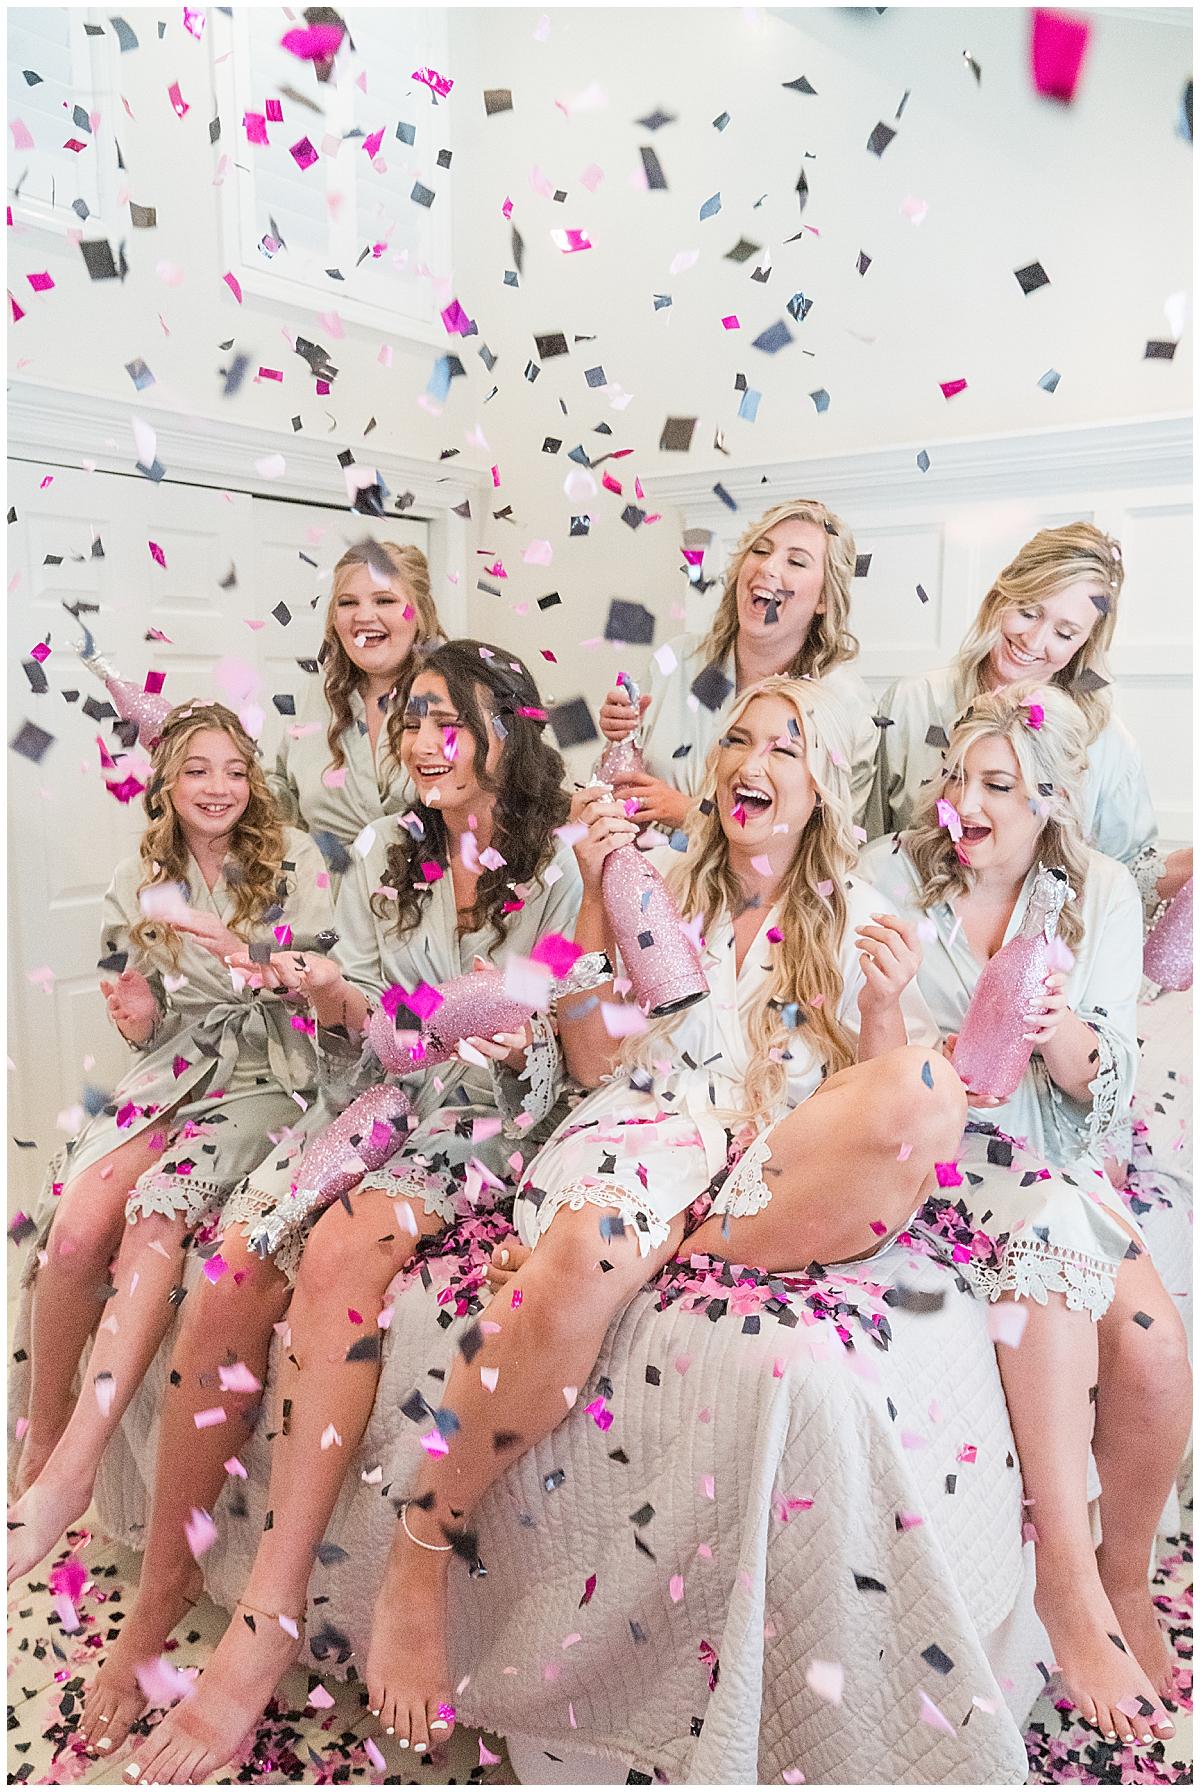 bride and bridesamids pop confetti during wedding day prep